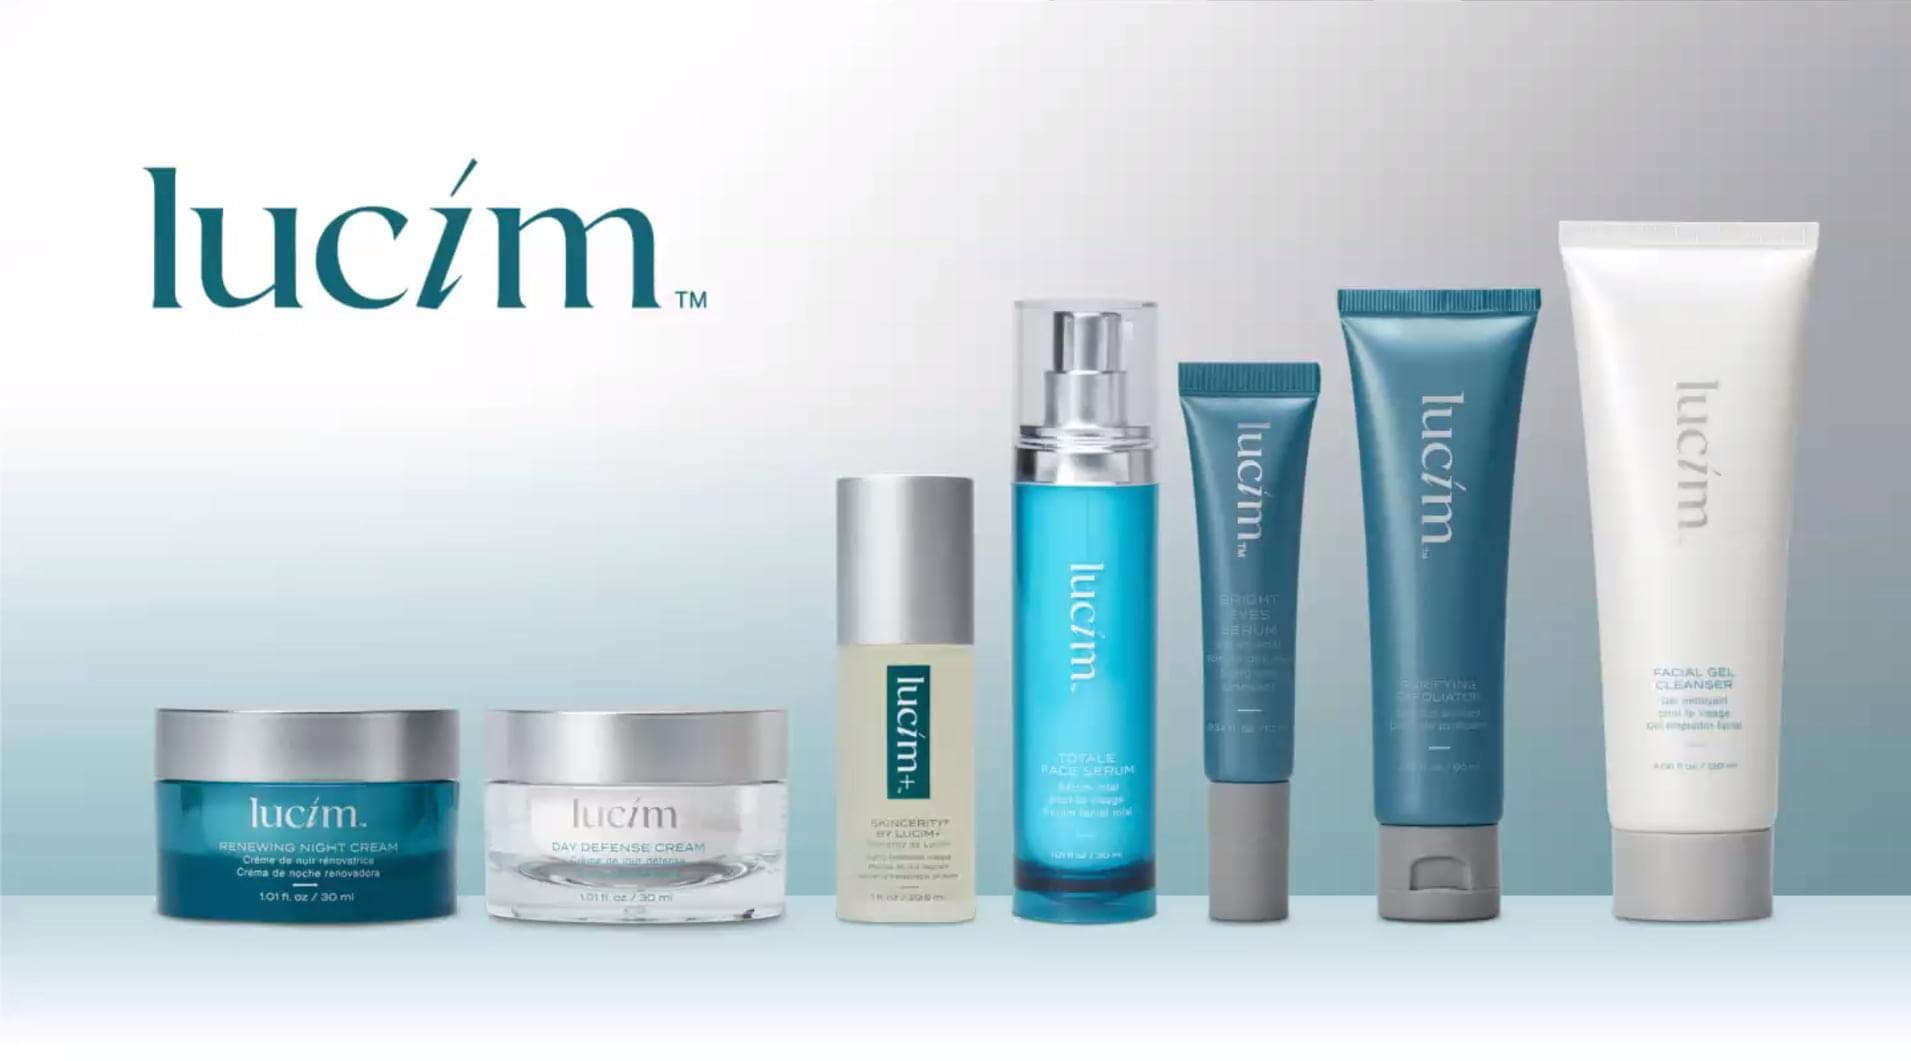 Lucim Product Line